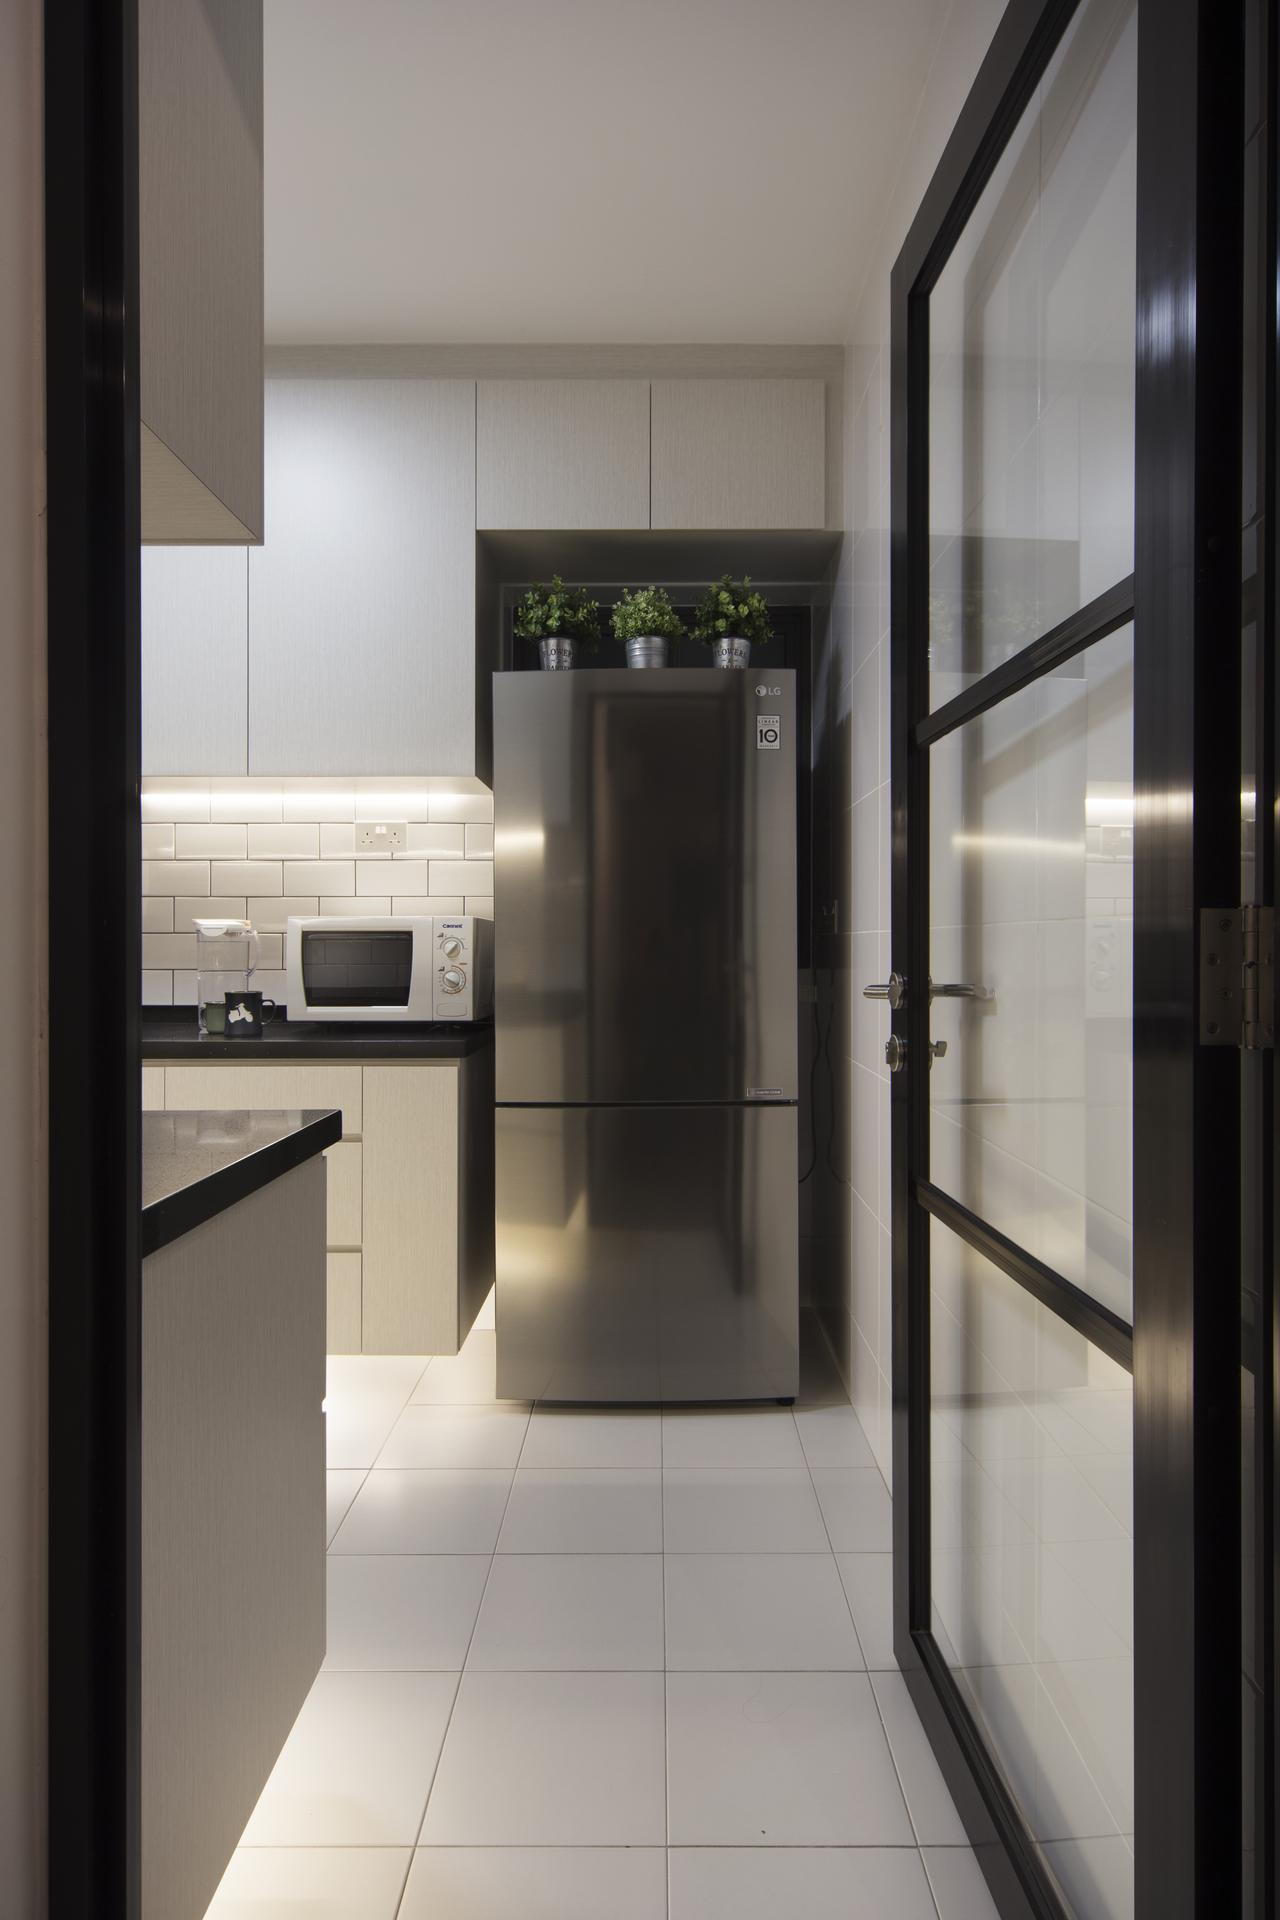 space concepts interior design 6 home renovation singapore